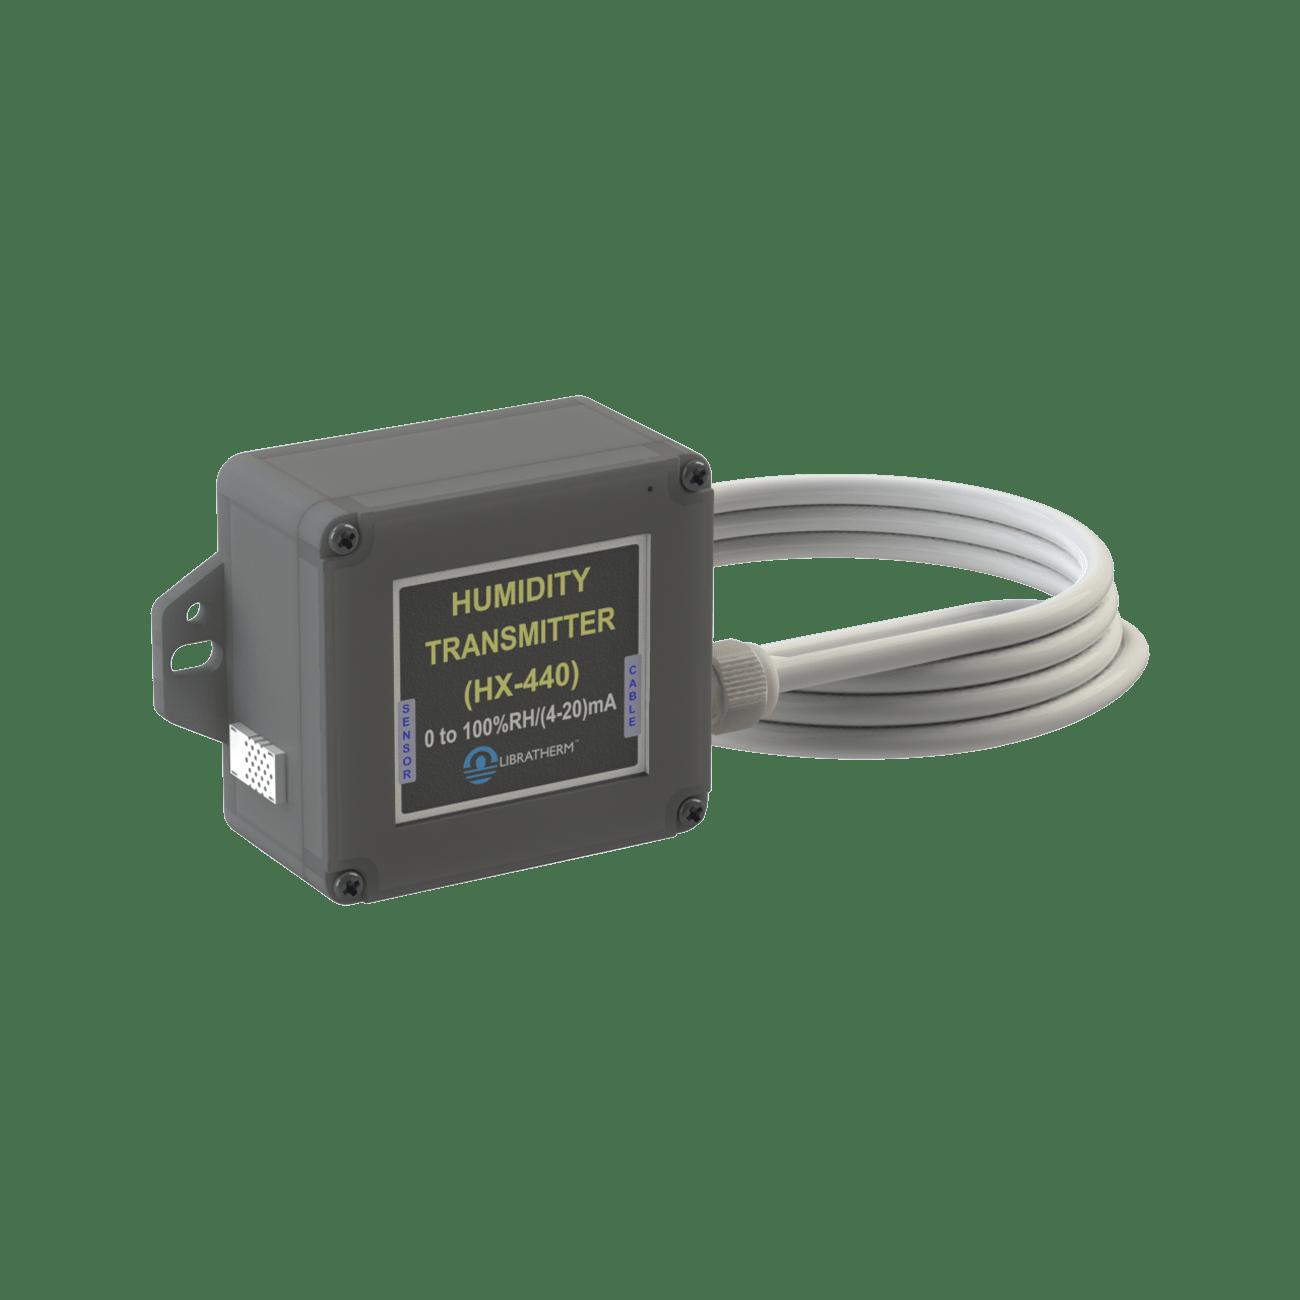 humidity-transmitter-hx-440-right